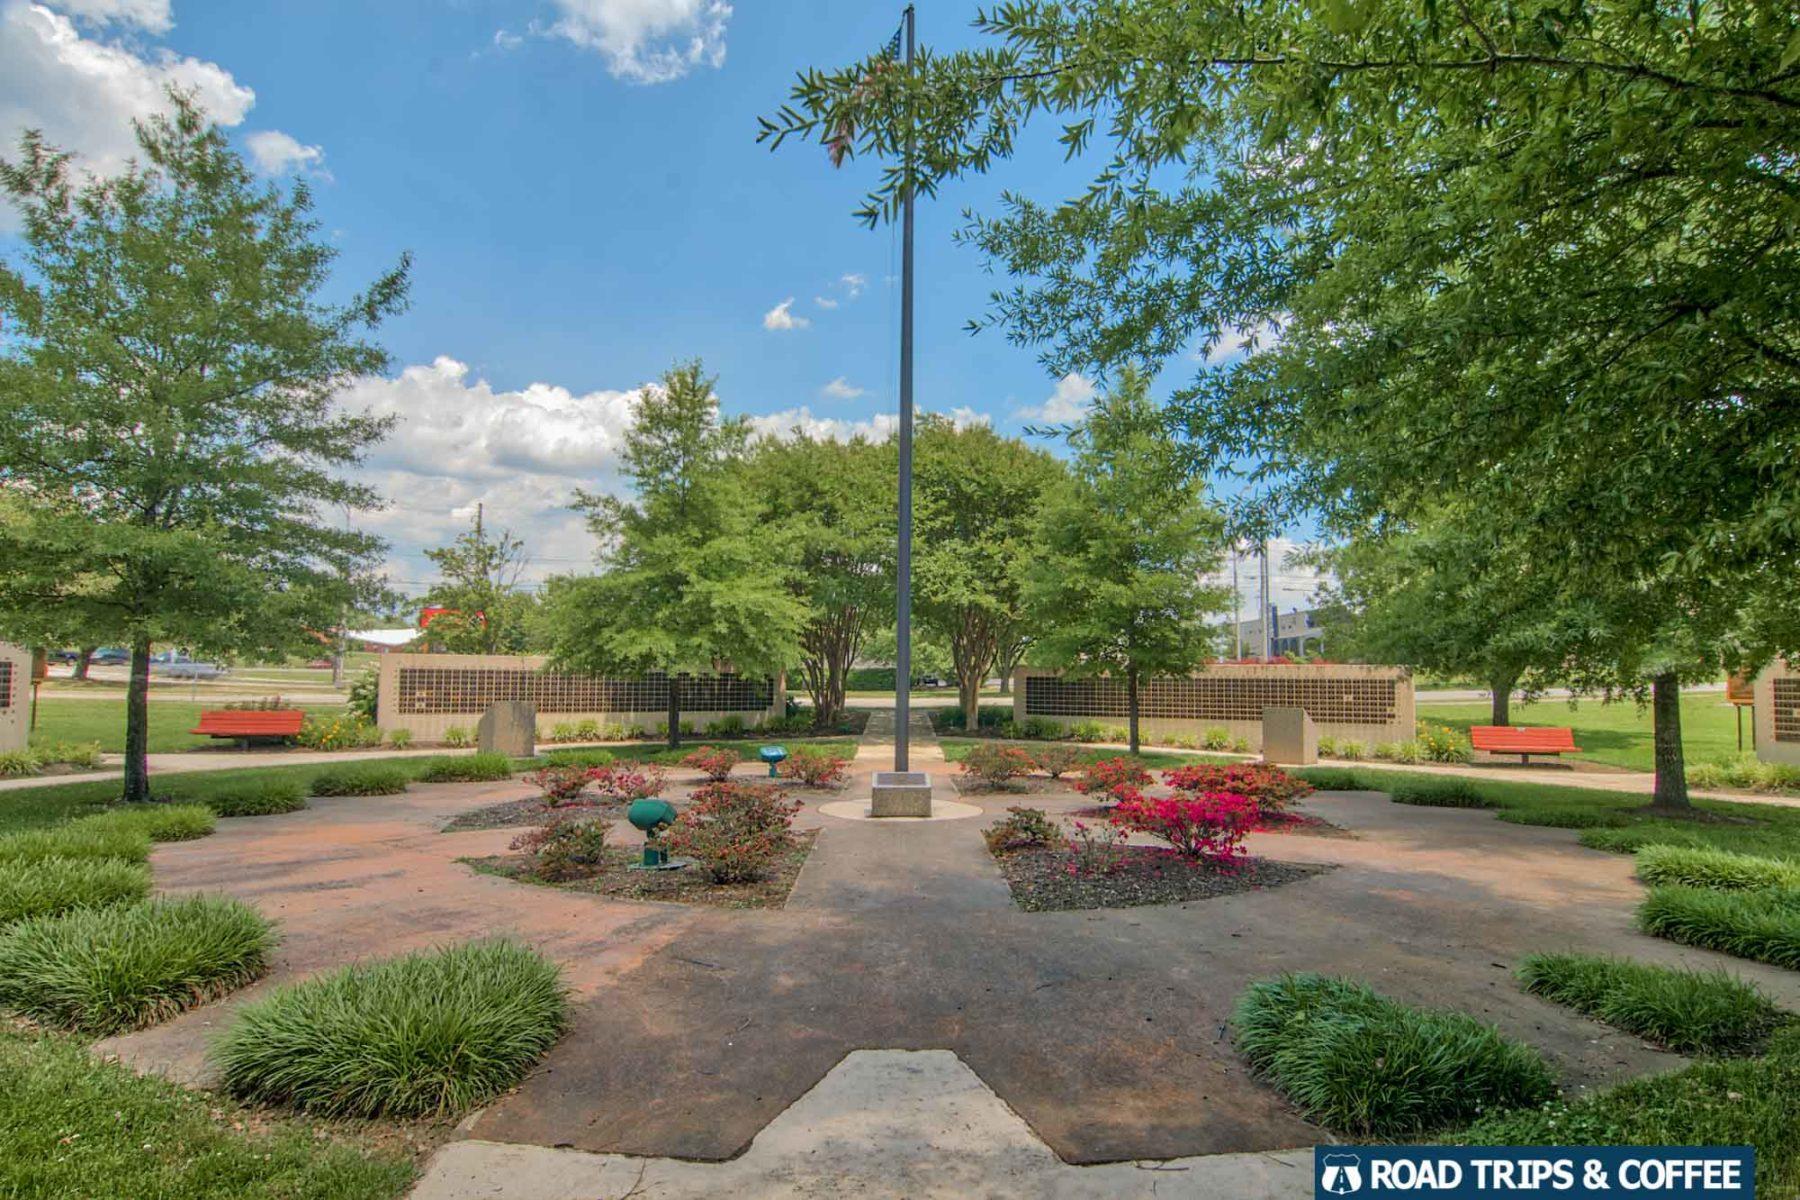 A brick path wraps around a small park at the Secret City Commemorative Walk in Oak Ridge, Tennessee